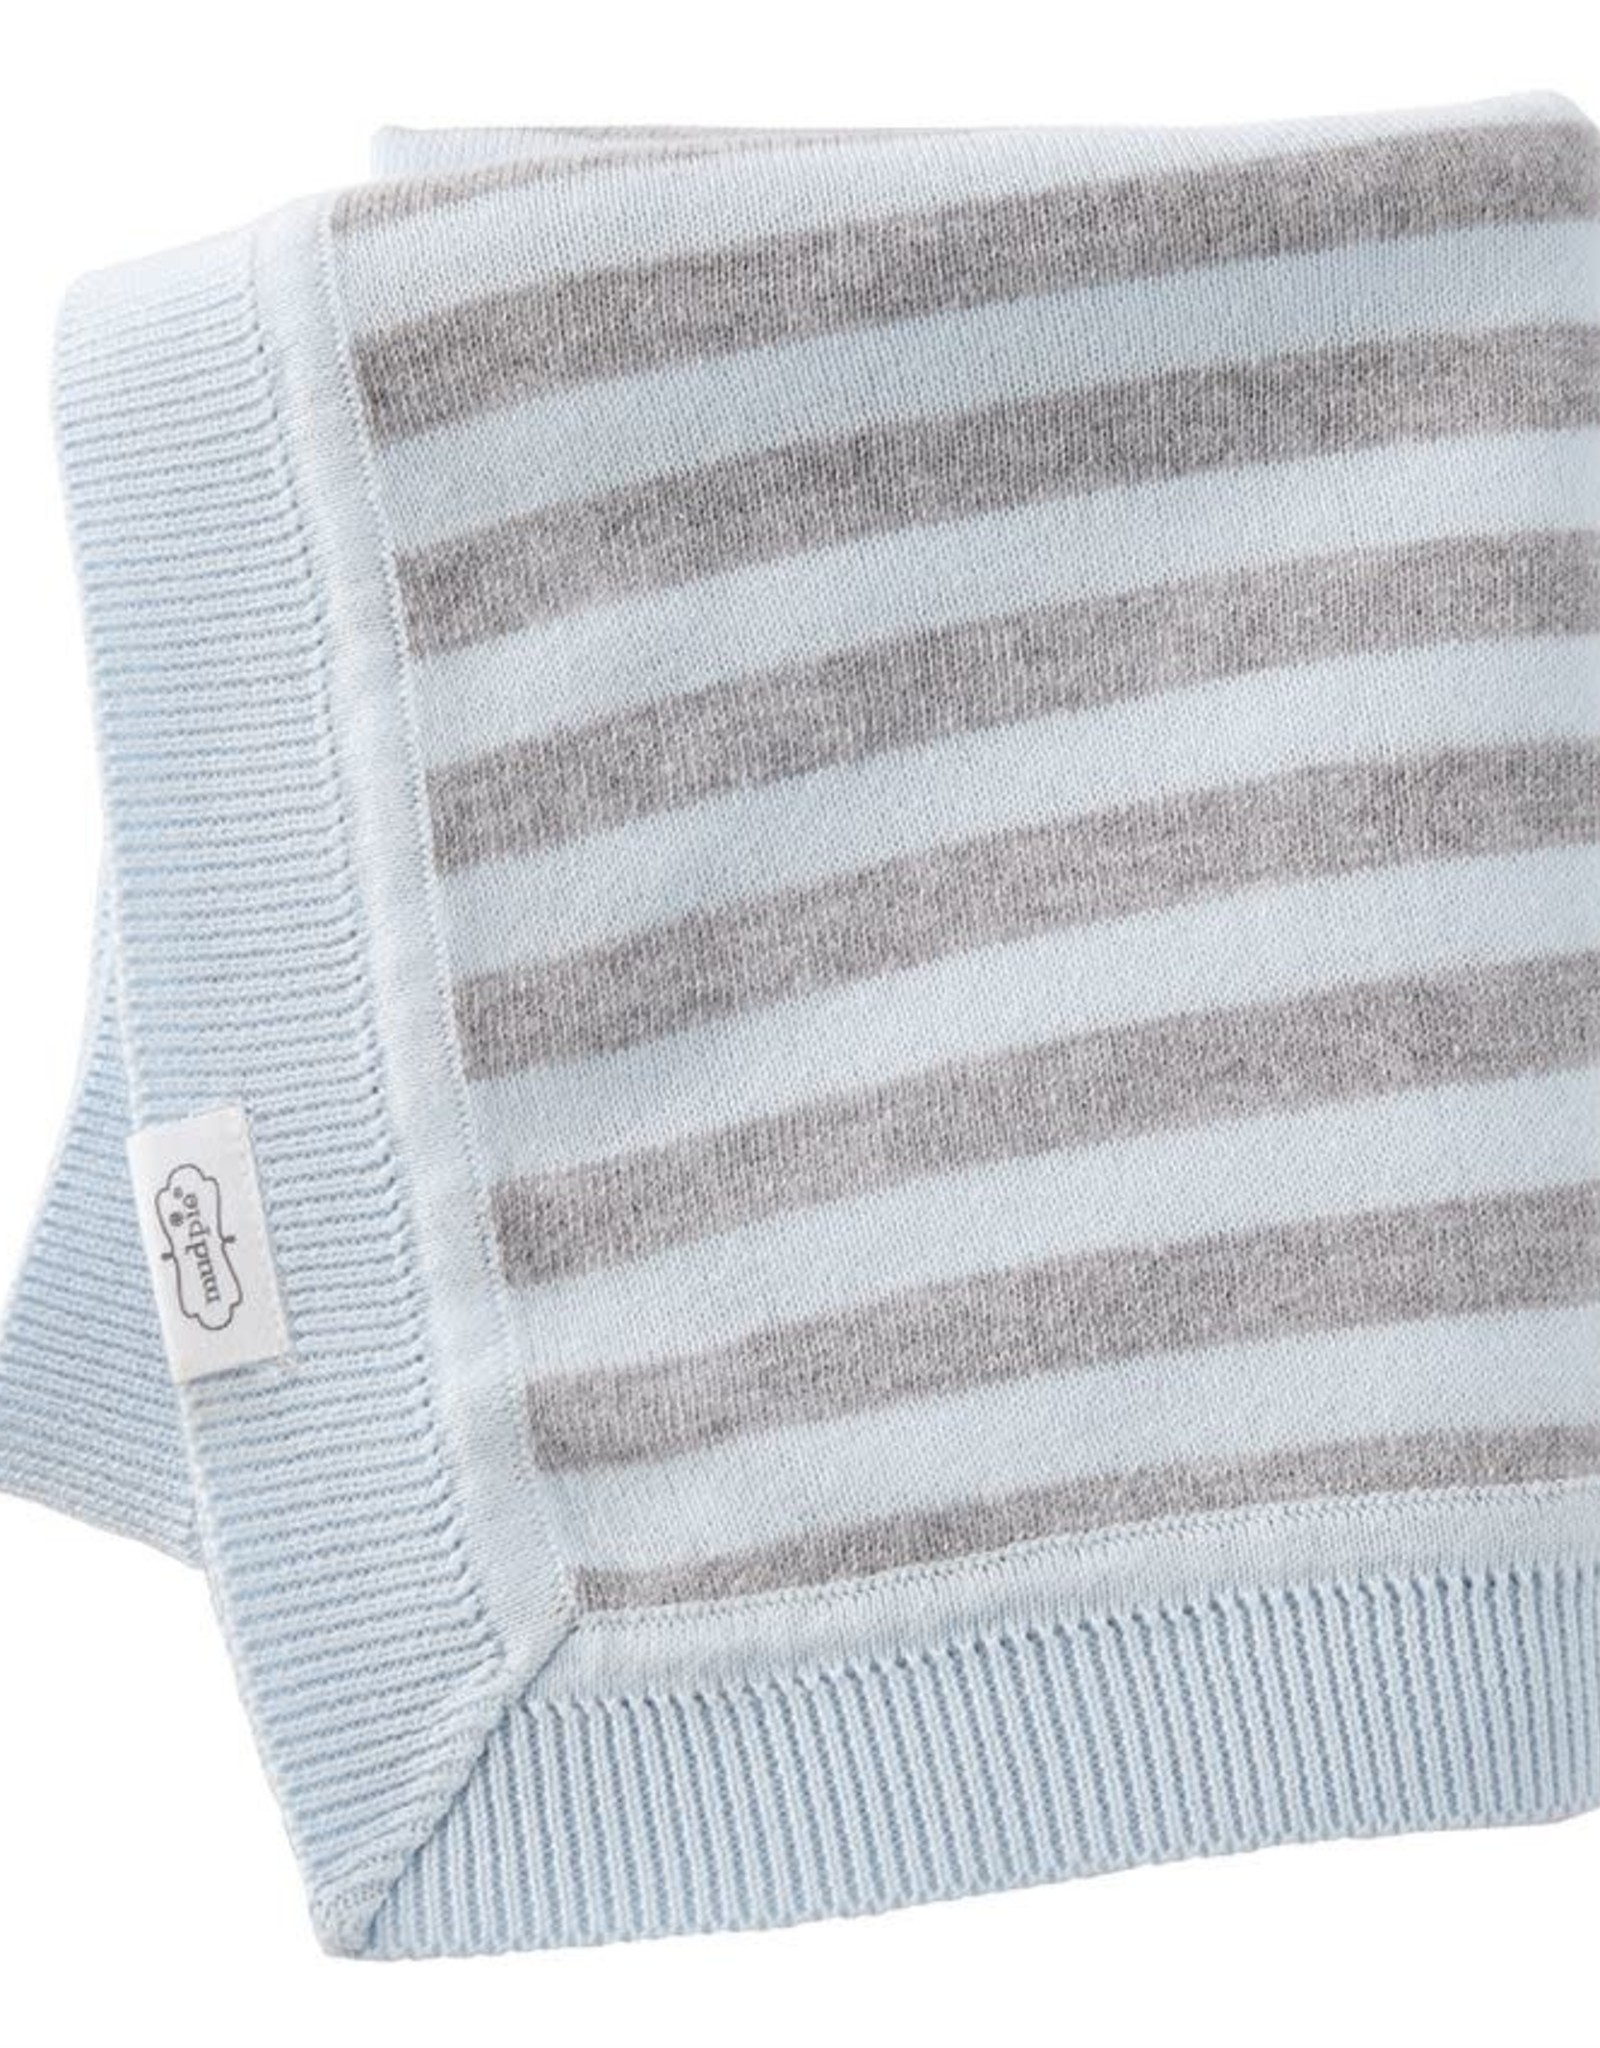 Blue & Gray Knit Blanket